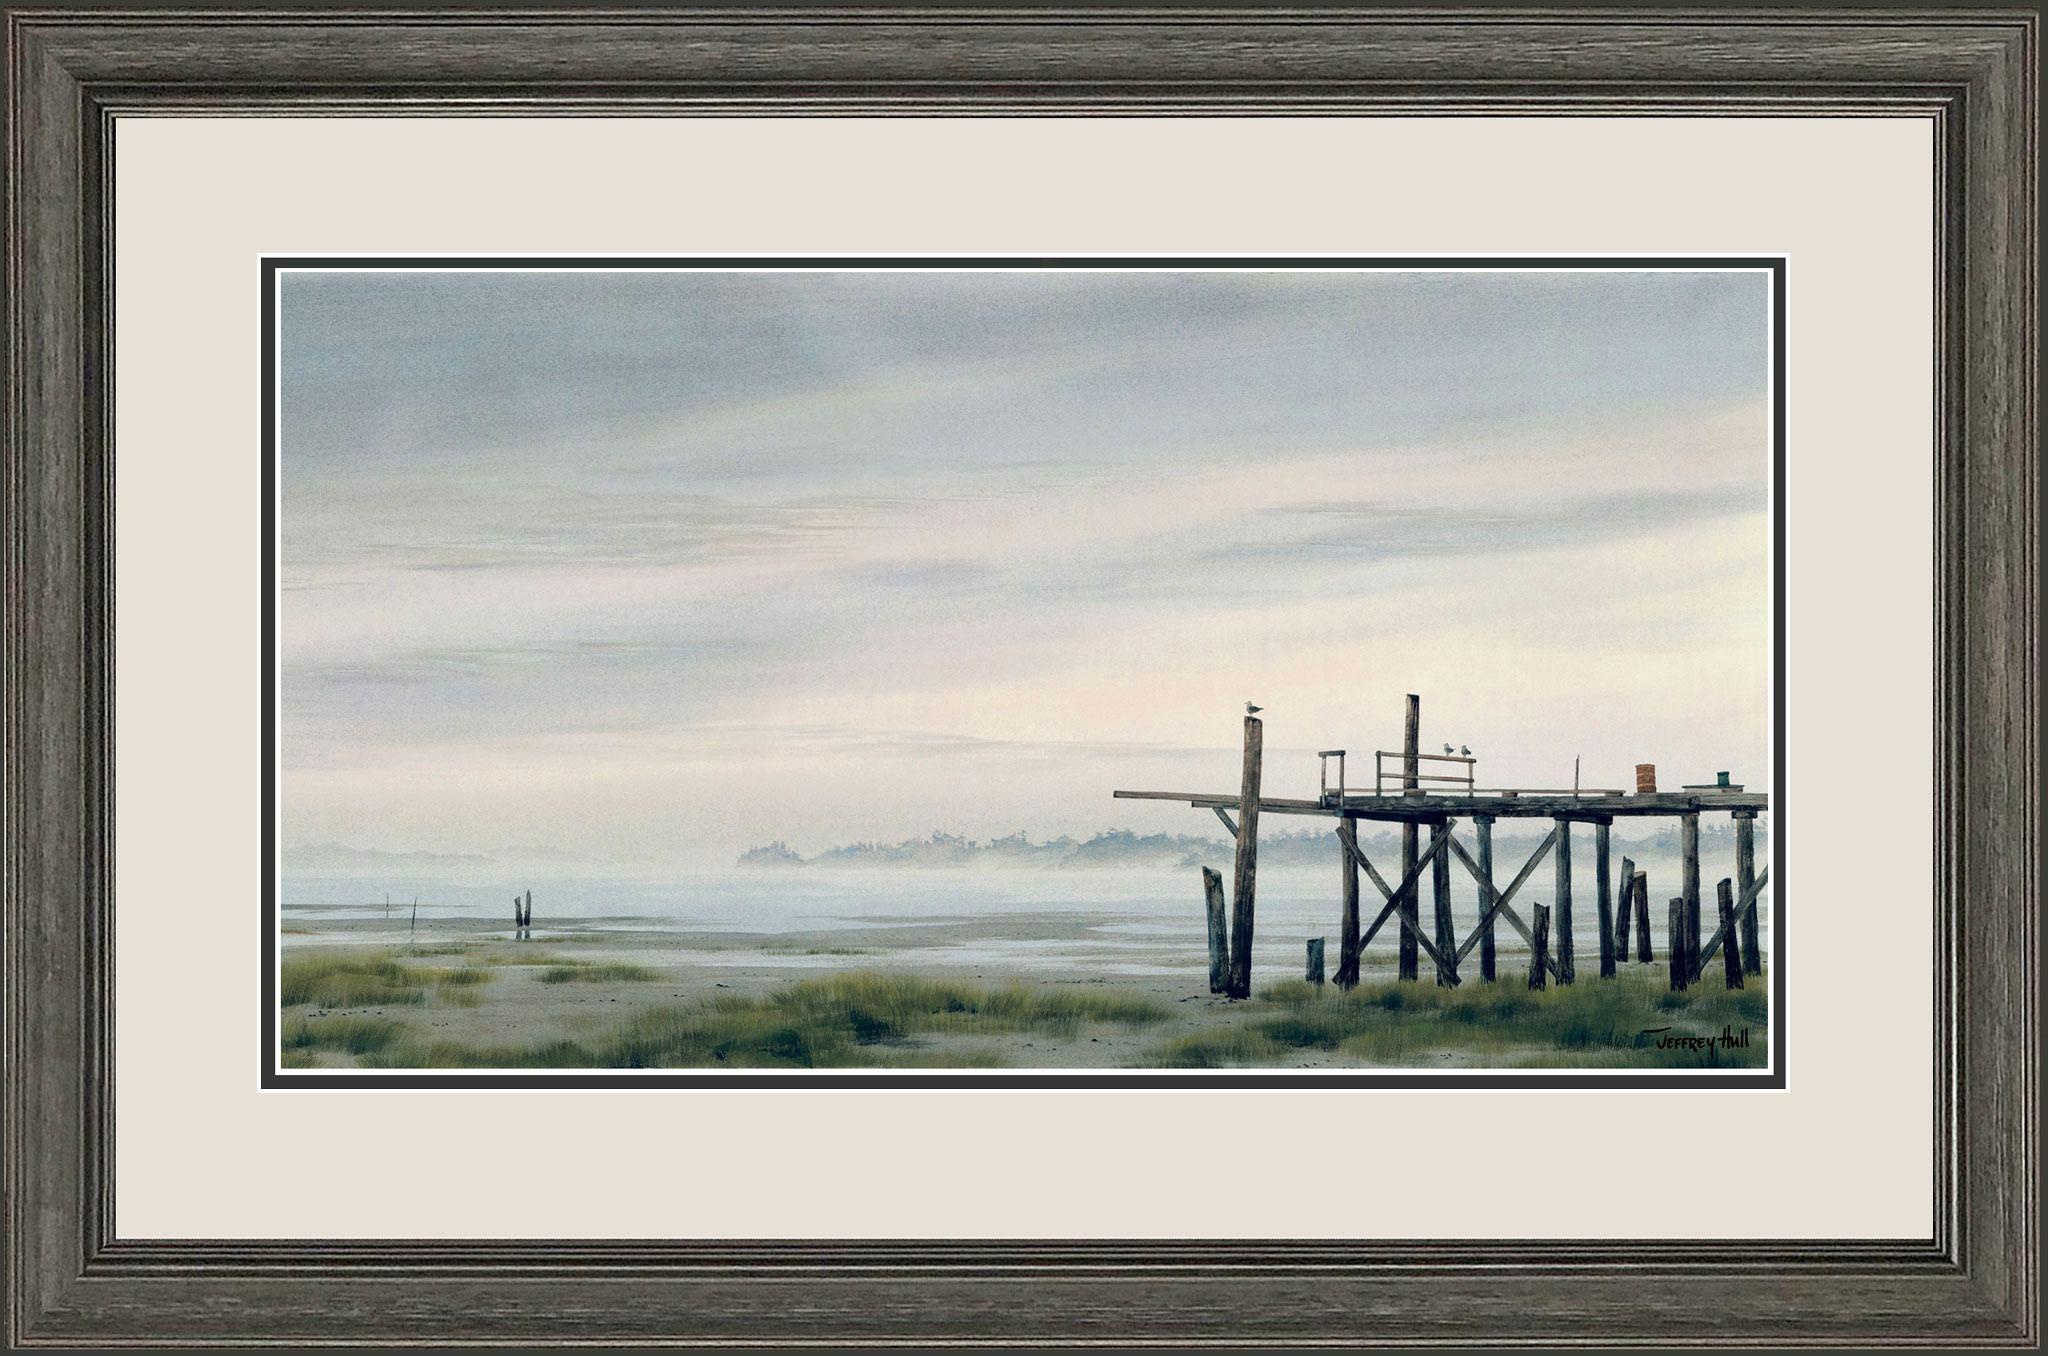 Tide-Flats-OpenEd-Cascade-Seamist-Dark-Shale-4-Website-2021